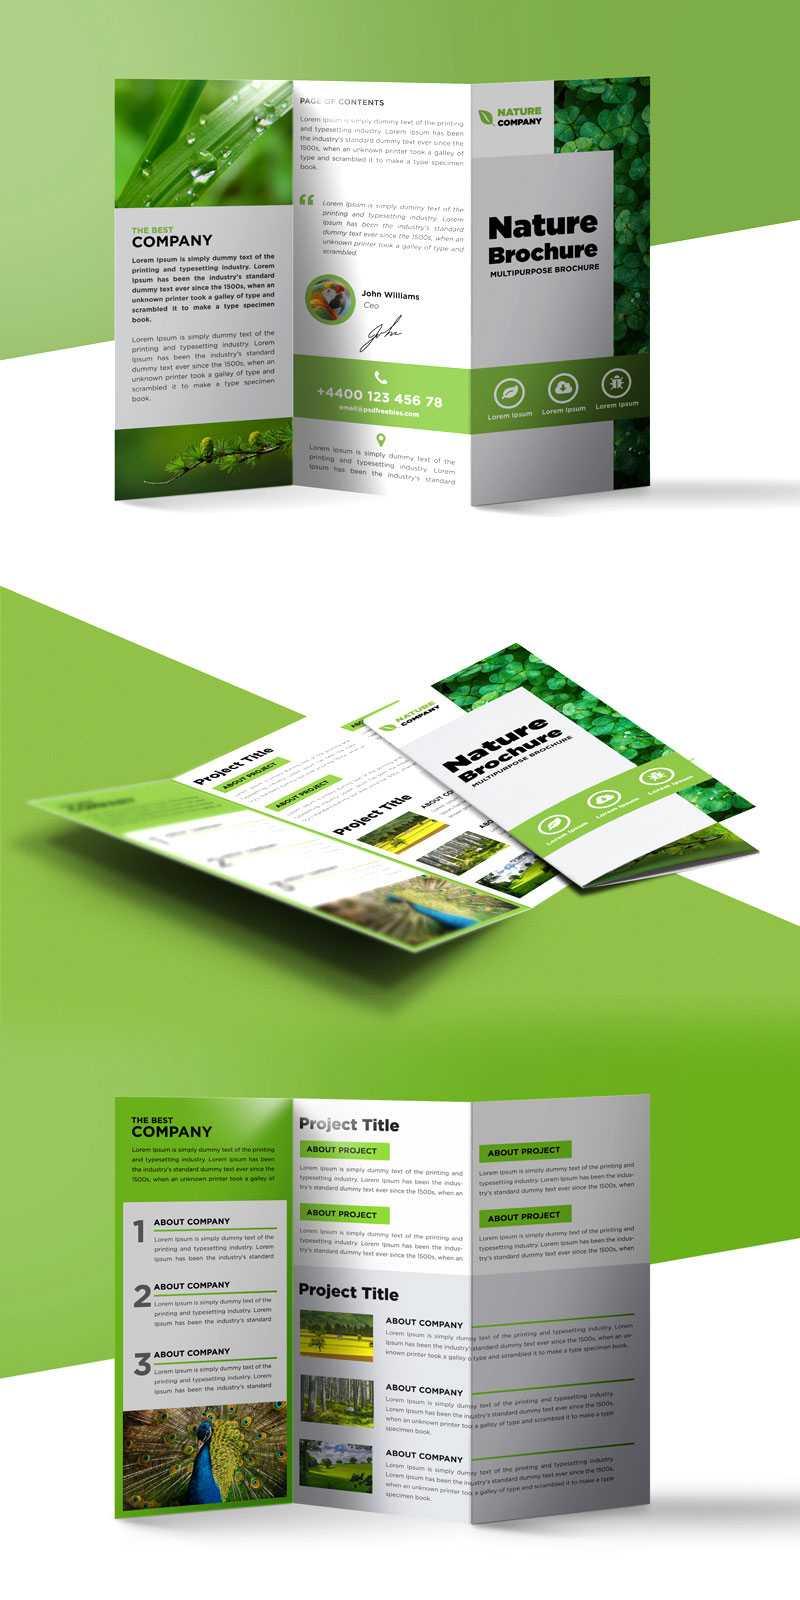 Tri Fold Brochure Template A4 Free #1502 for Tri Fold Brochure Template Indesign Free Download